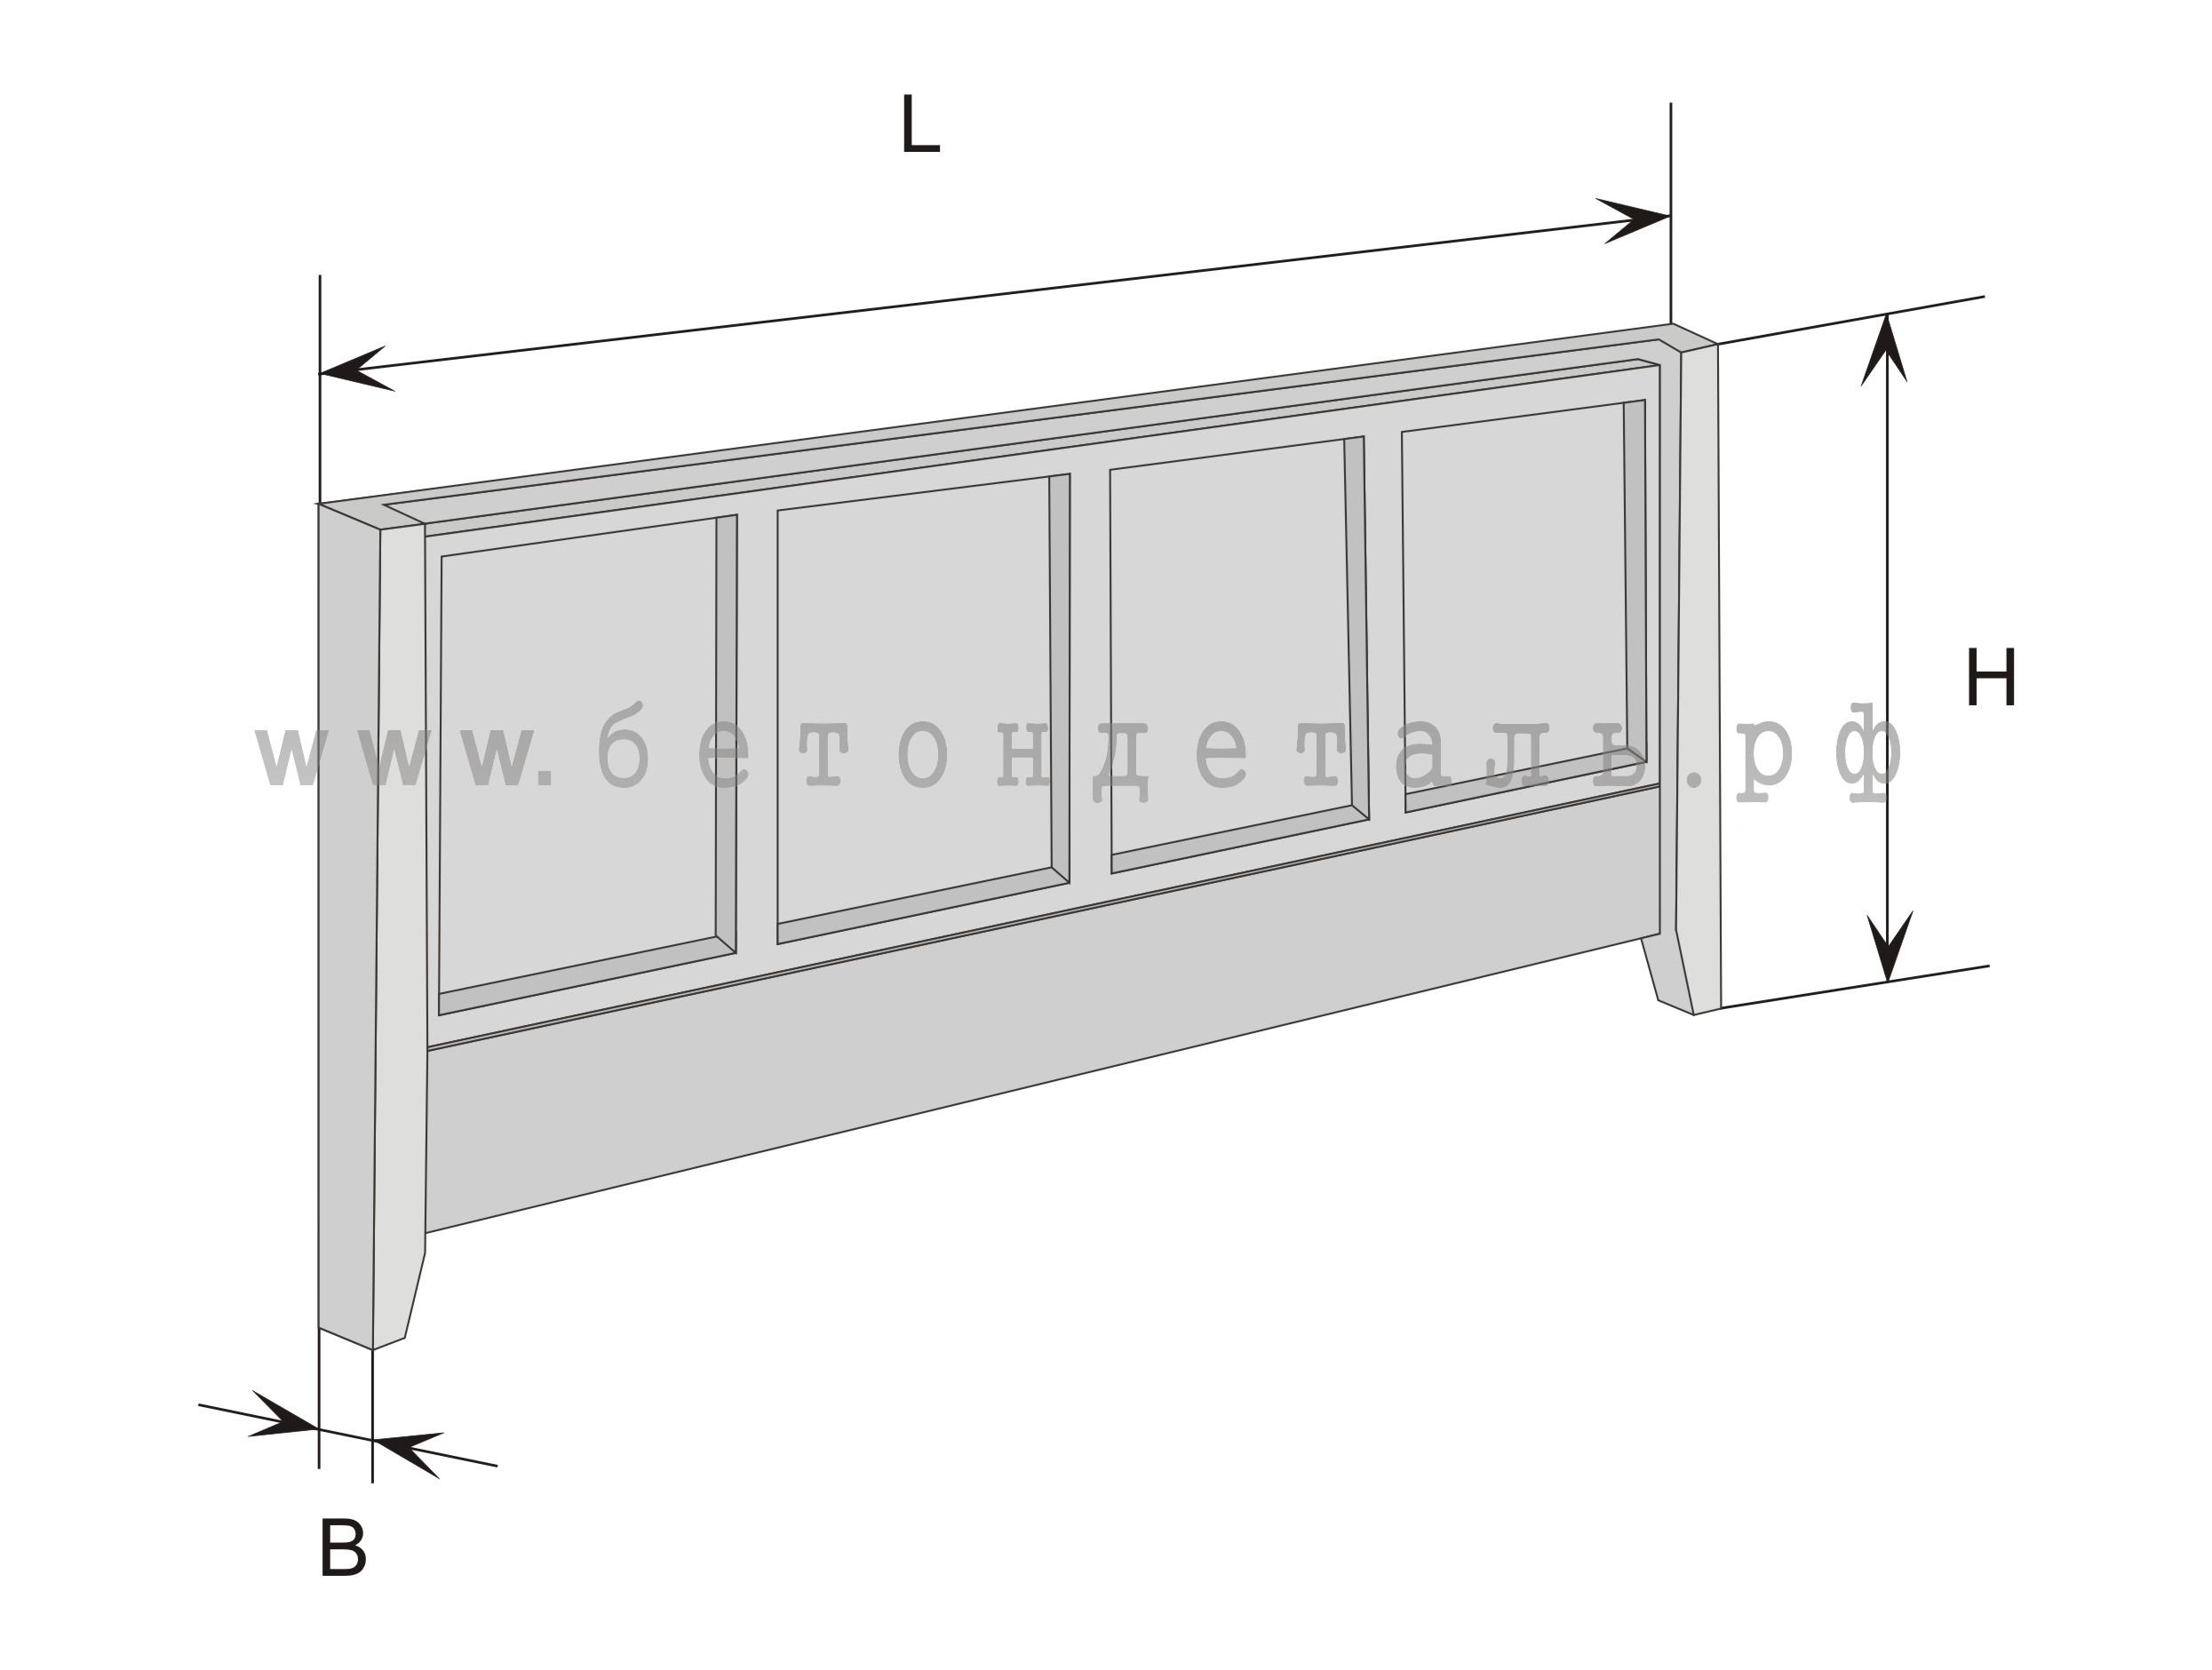 Железобетонная плита 4х2 м сортамент плиты перекрытия железобетонные